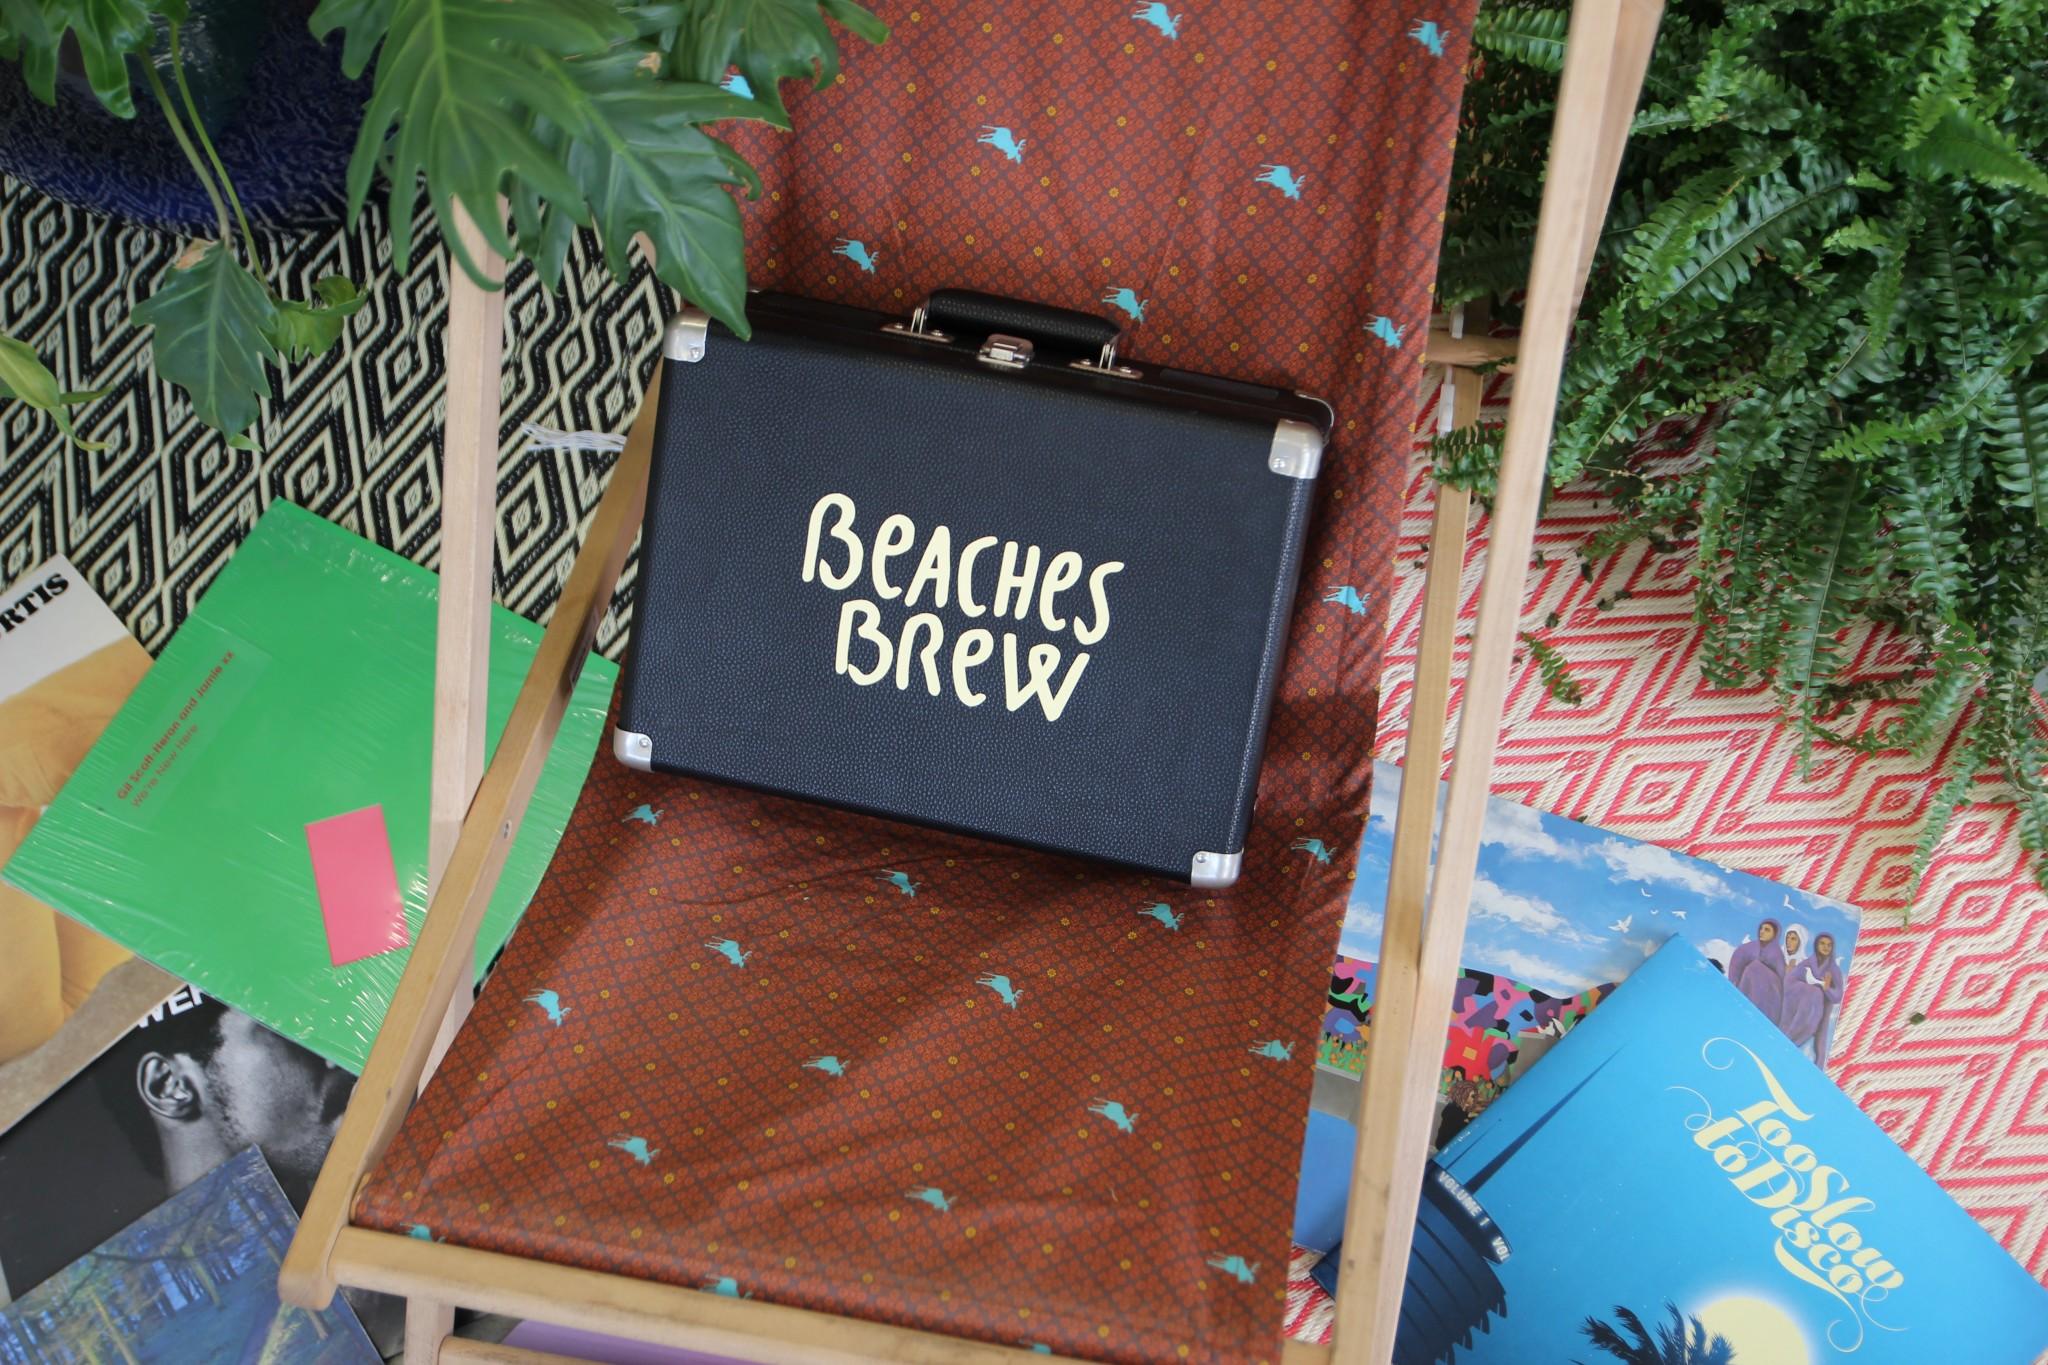 BEACHES BREW X CROSLEY V